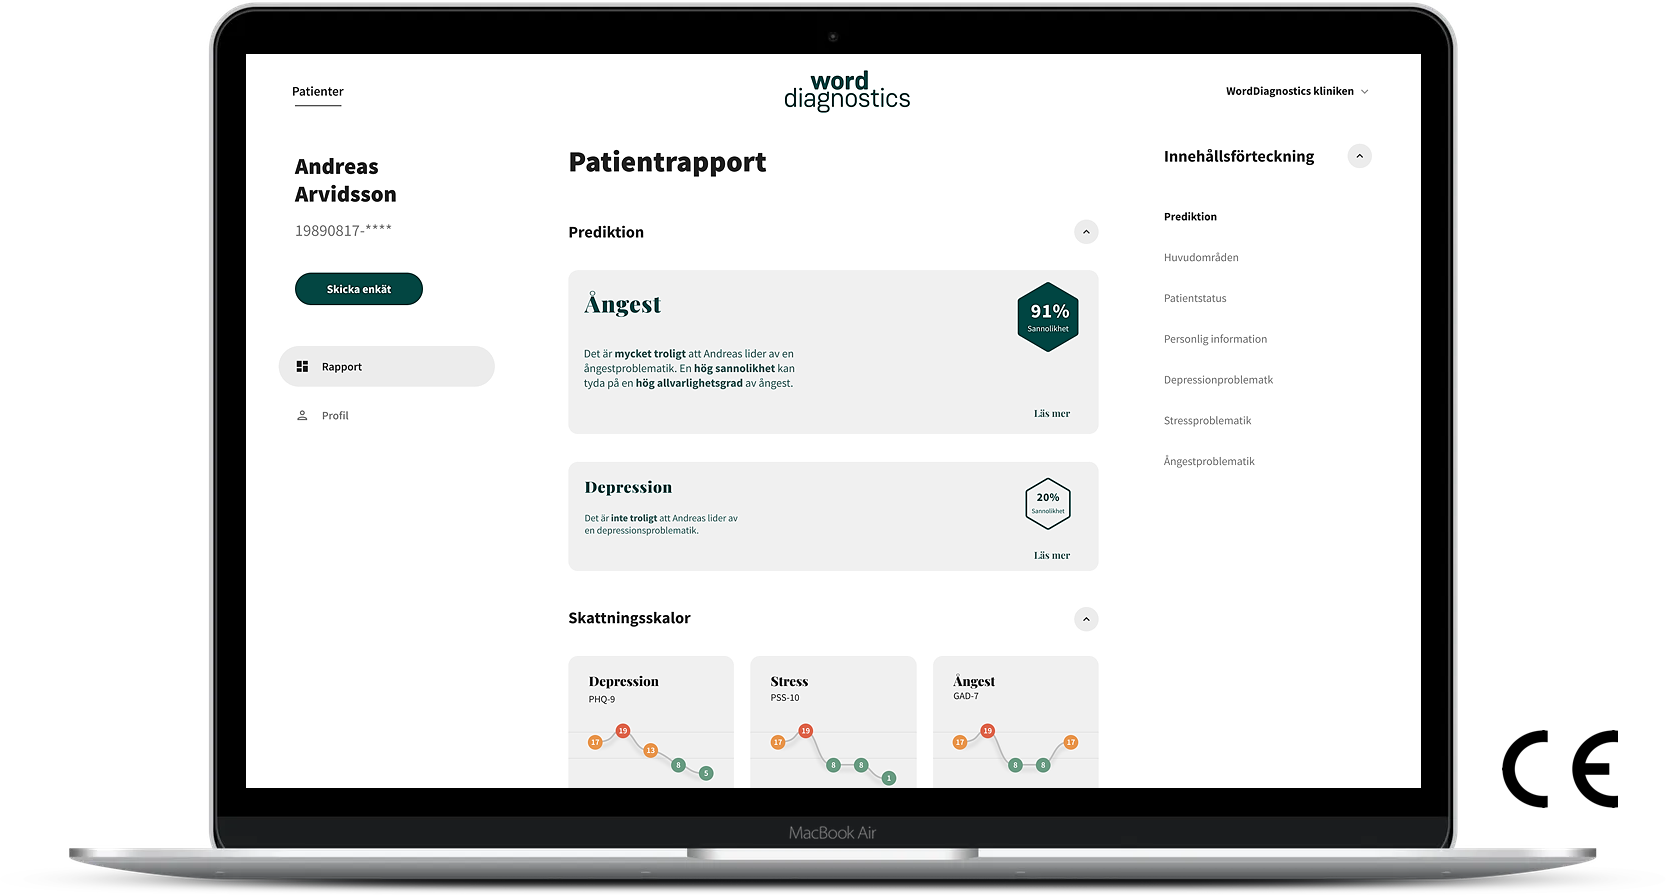 WordDiagnostics Patient Report